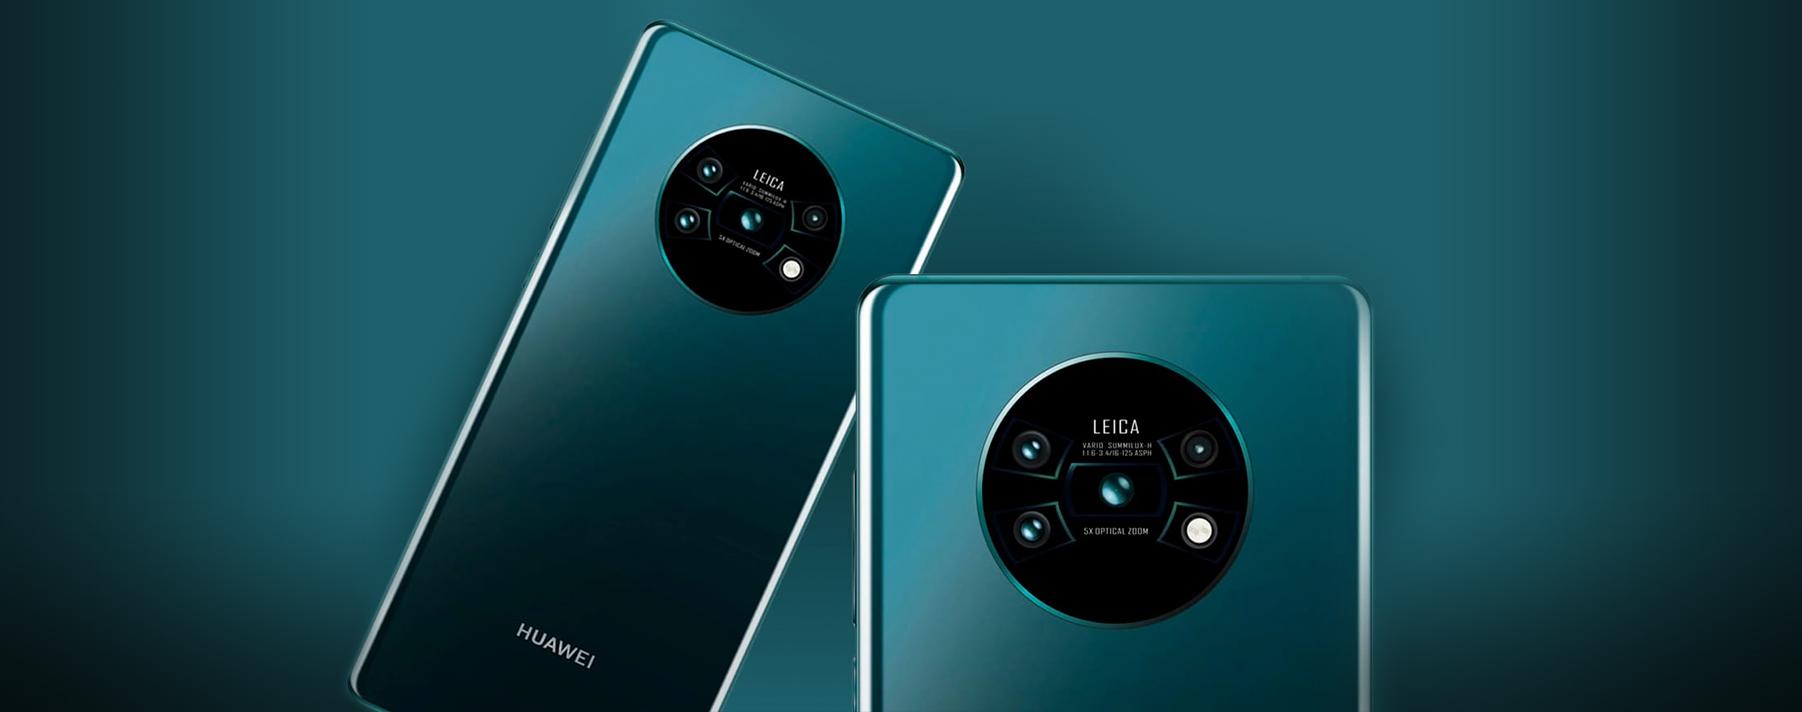 Huawei Mate 30 Pro. Incorporaría un procesador actualizado frente a su antecesor.